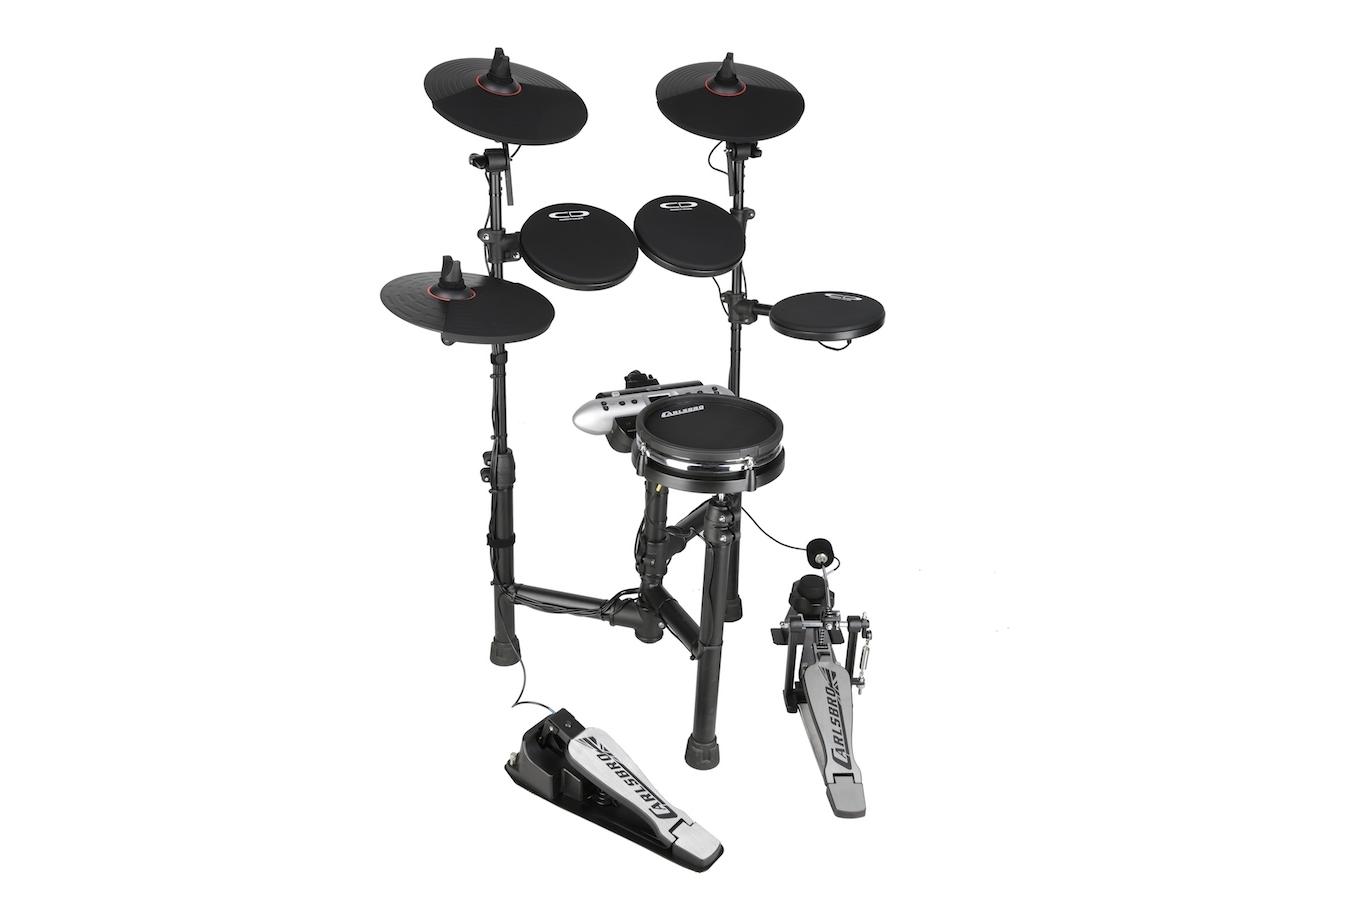 Carlsbro CSD130M mesh snare electronic drum set left side